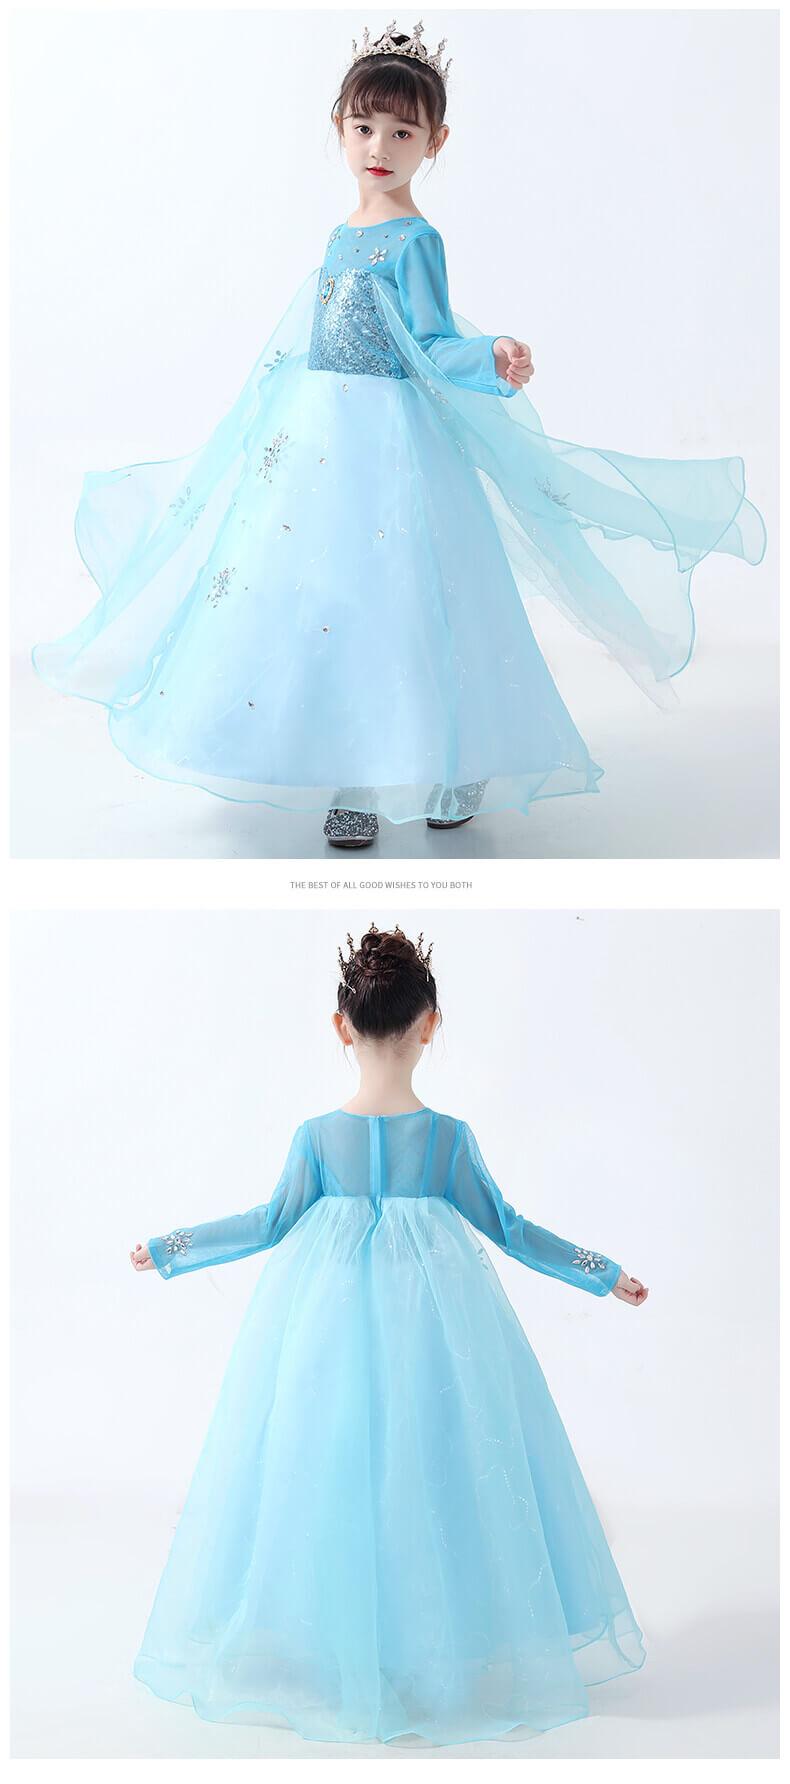 Girls Quality Disney Frozen 2 Elsa Dress Elsa Dress Up Costume For Kids